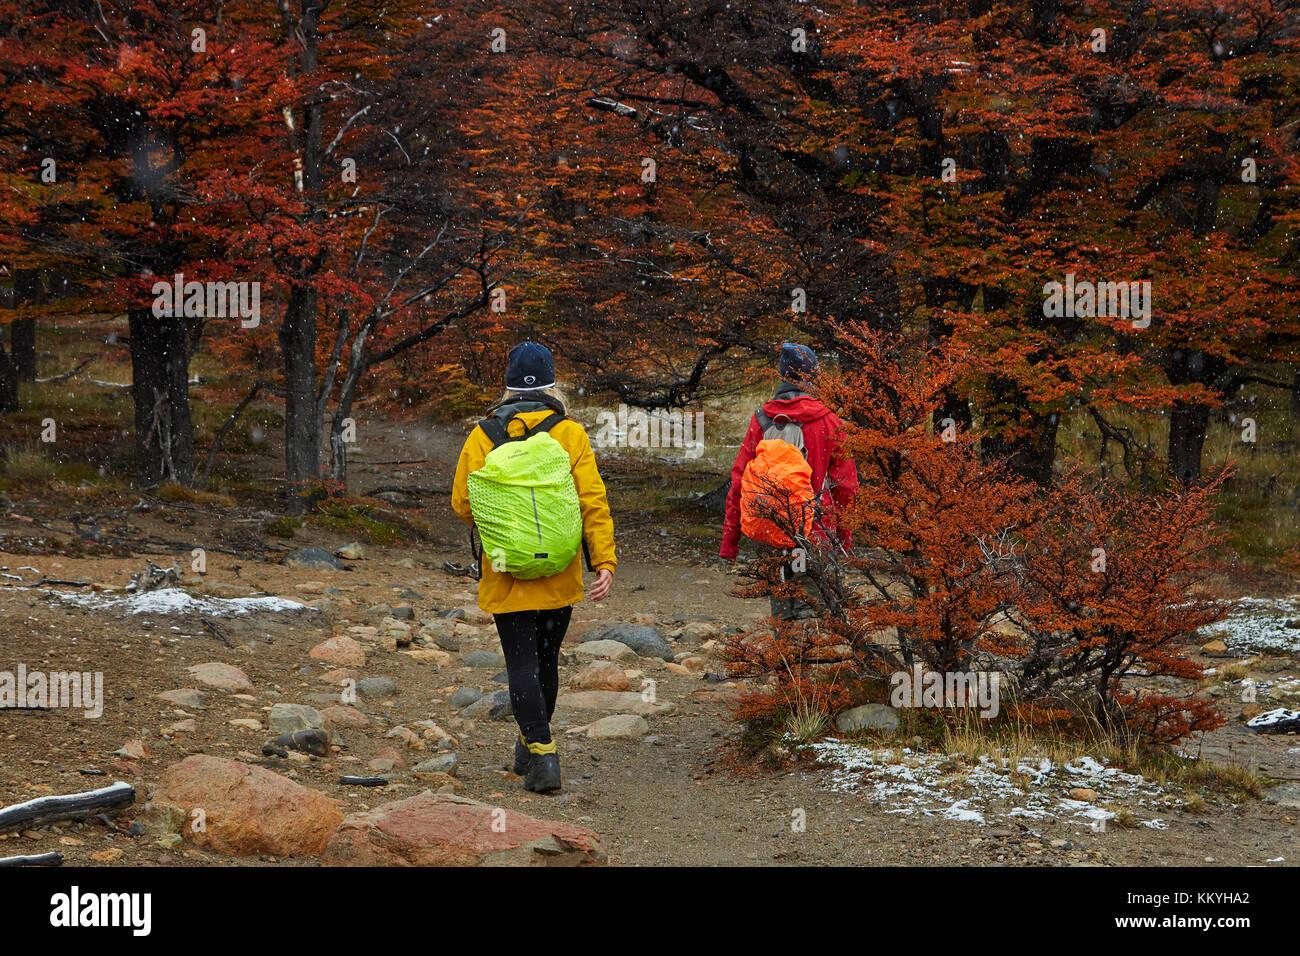 Wanderer in lenga Wald am Anschluss zur Laguna de los Tres, Parque Nacional Los Glaciares (World Heritage Area), Stockbild